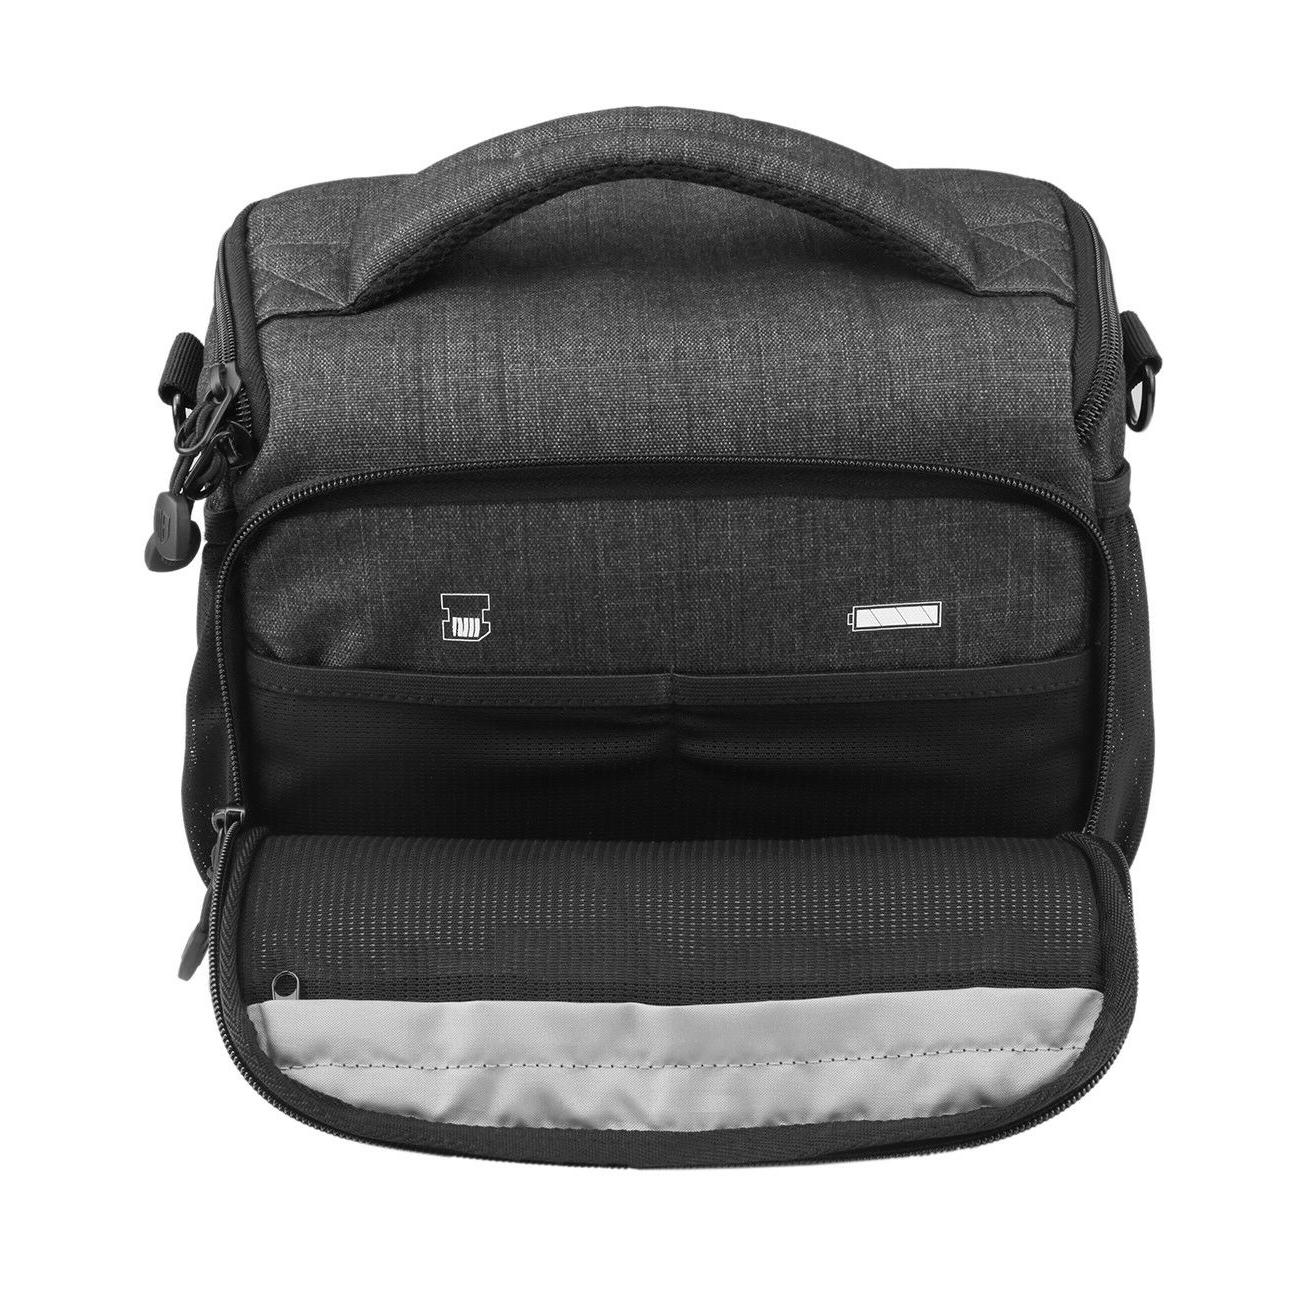 BAGSMART Compact Bag SLR/DSLR Waterproof